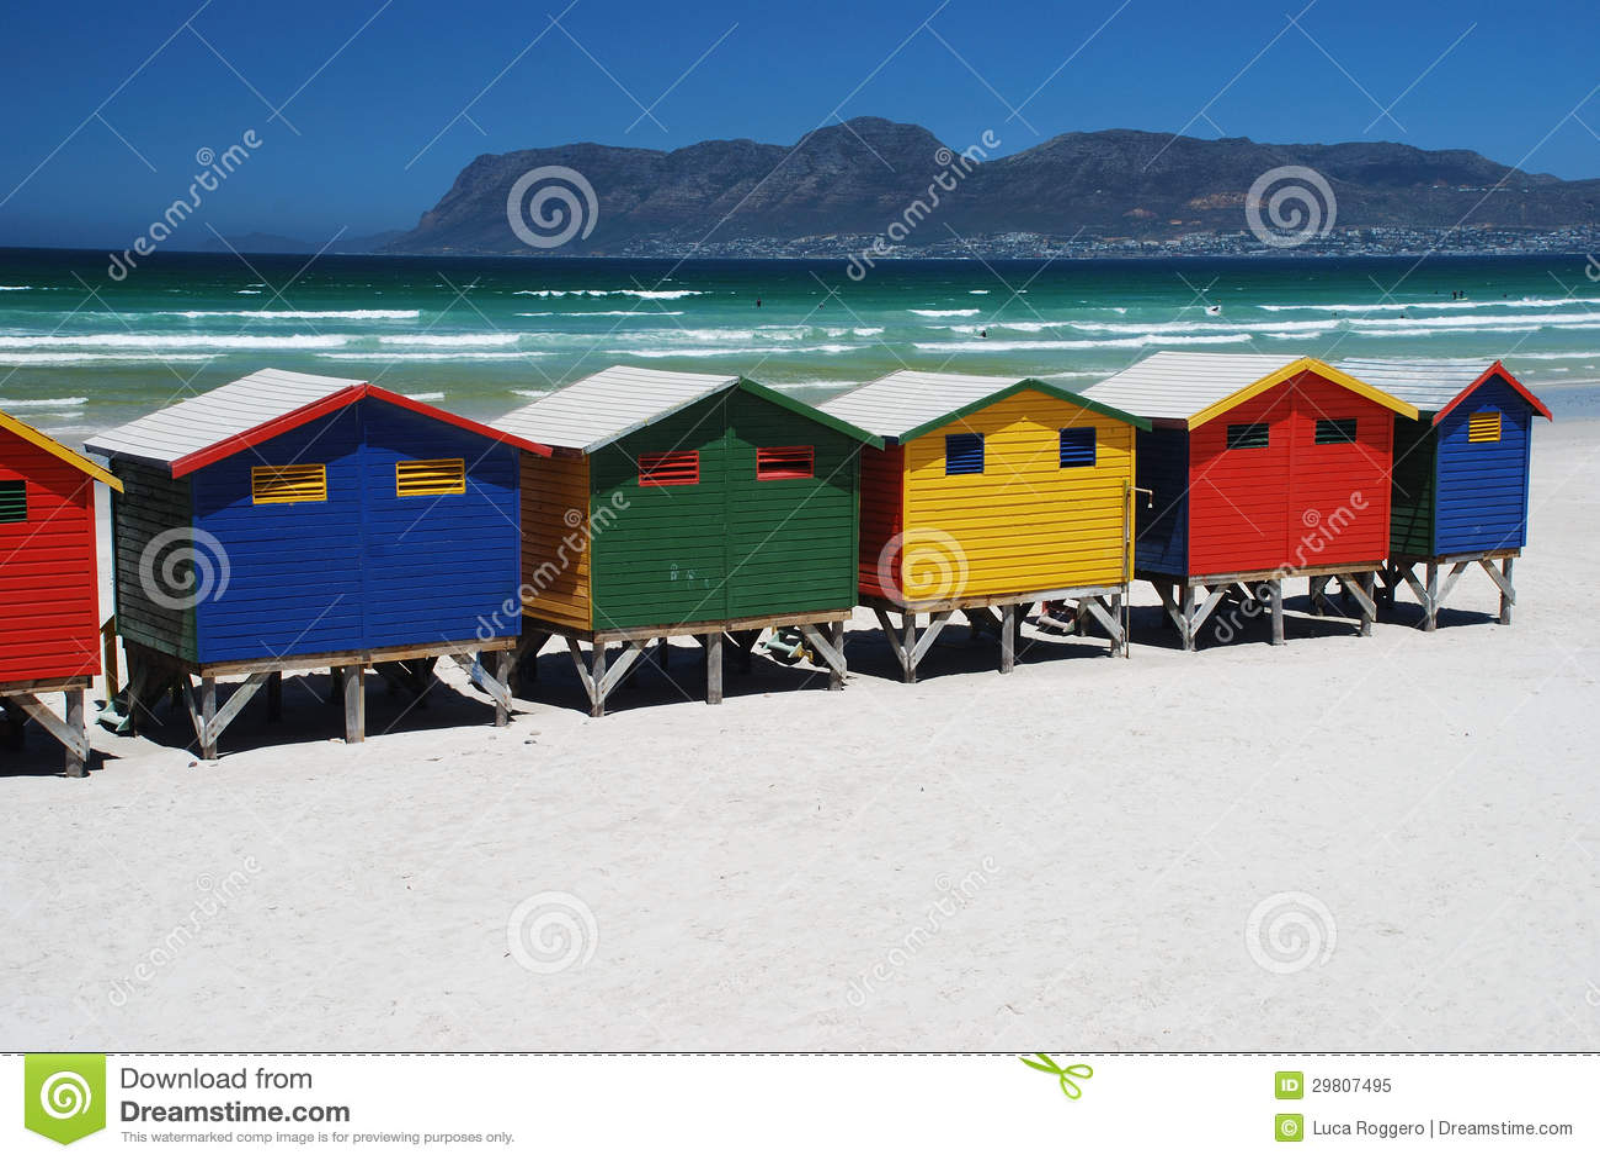 Capanne della spiaggia in Muizenberg, Sudafrica